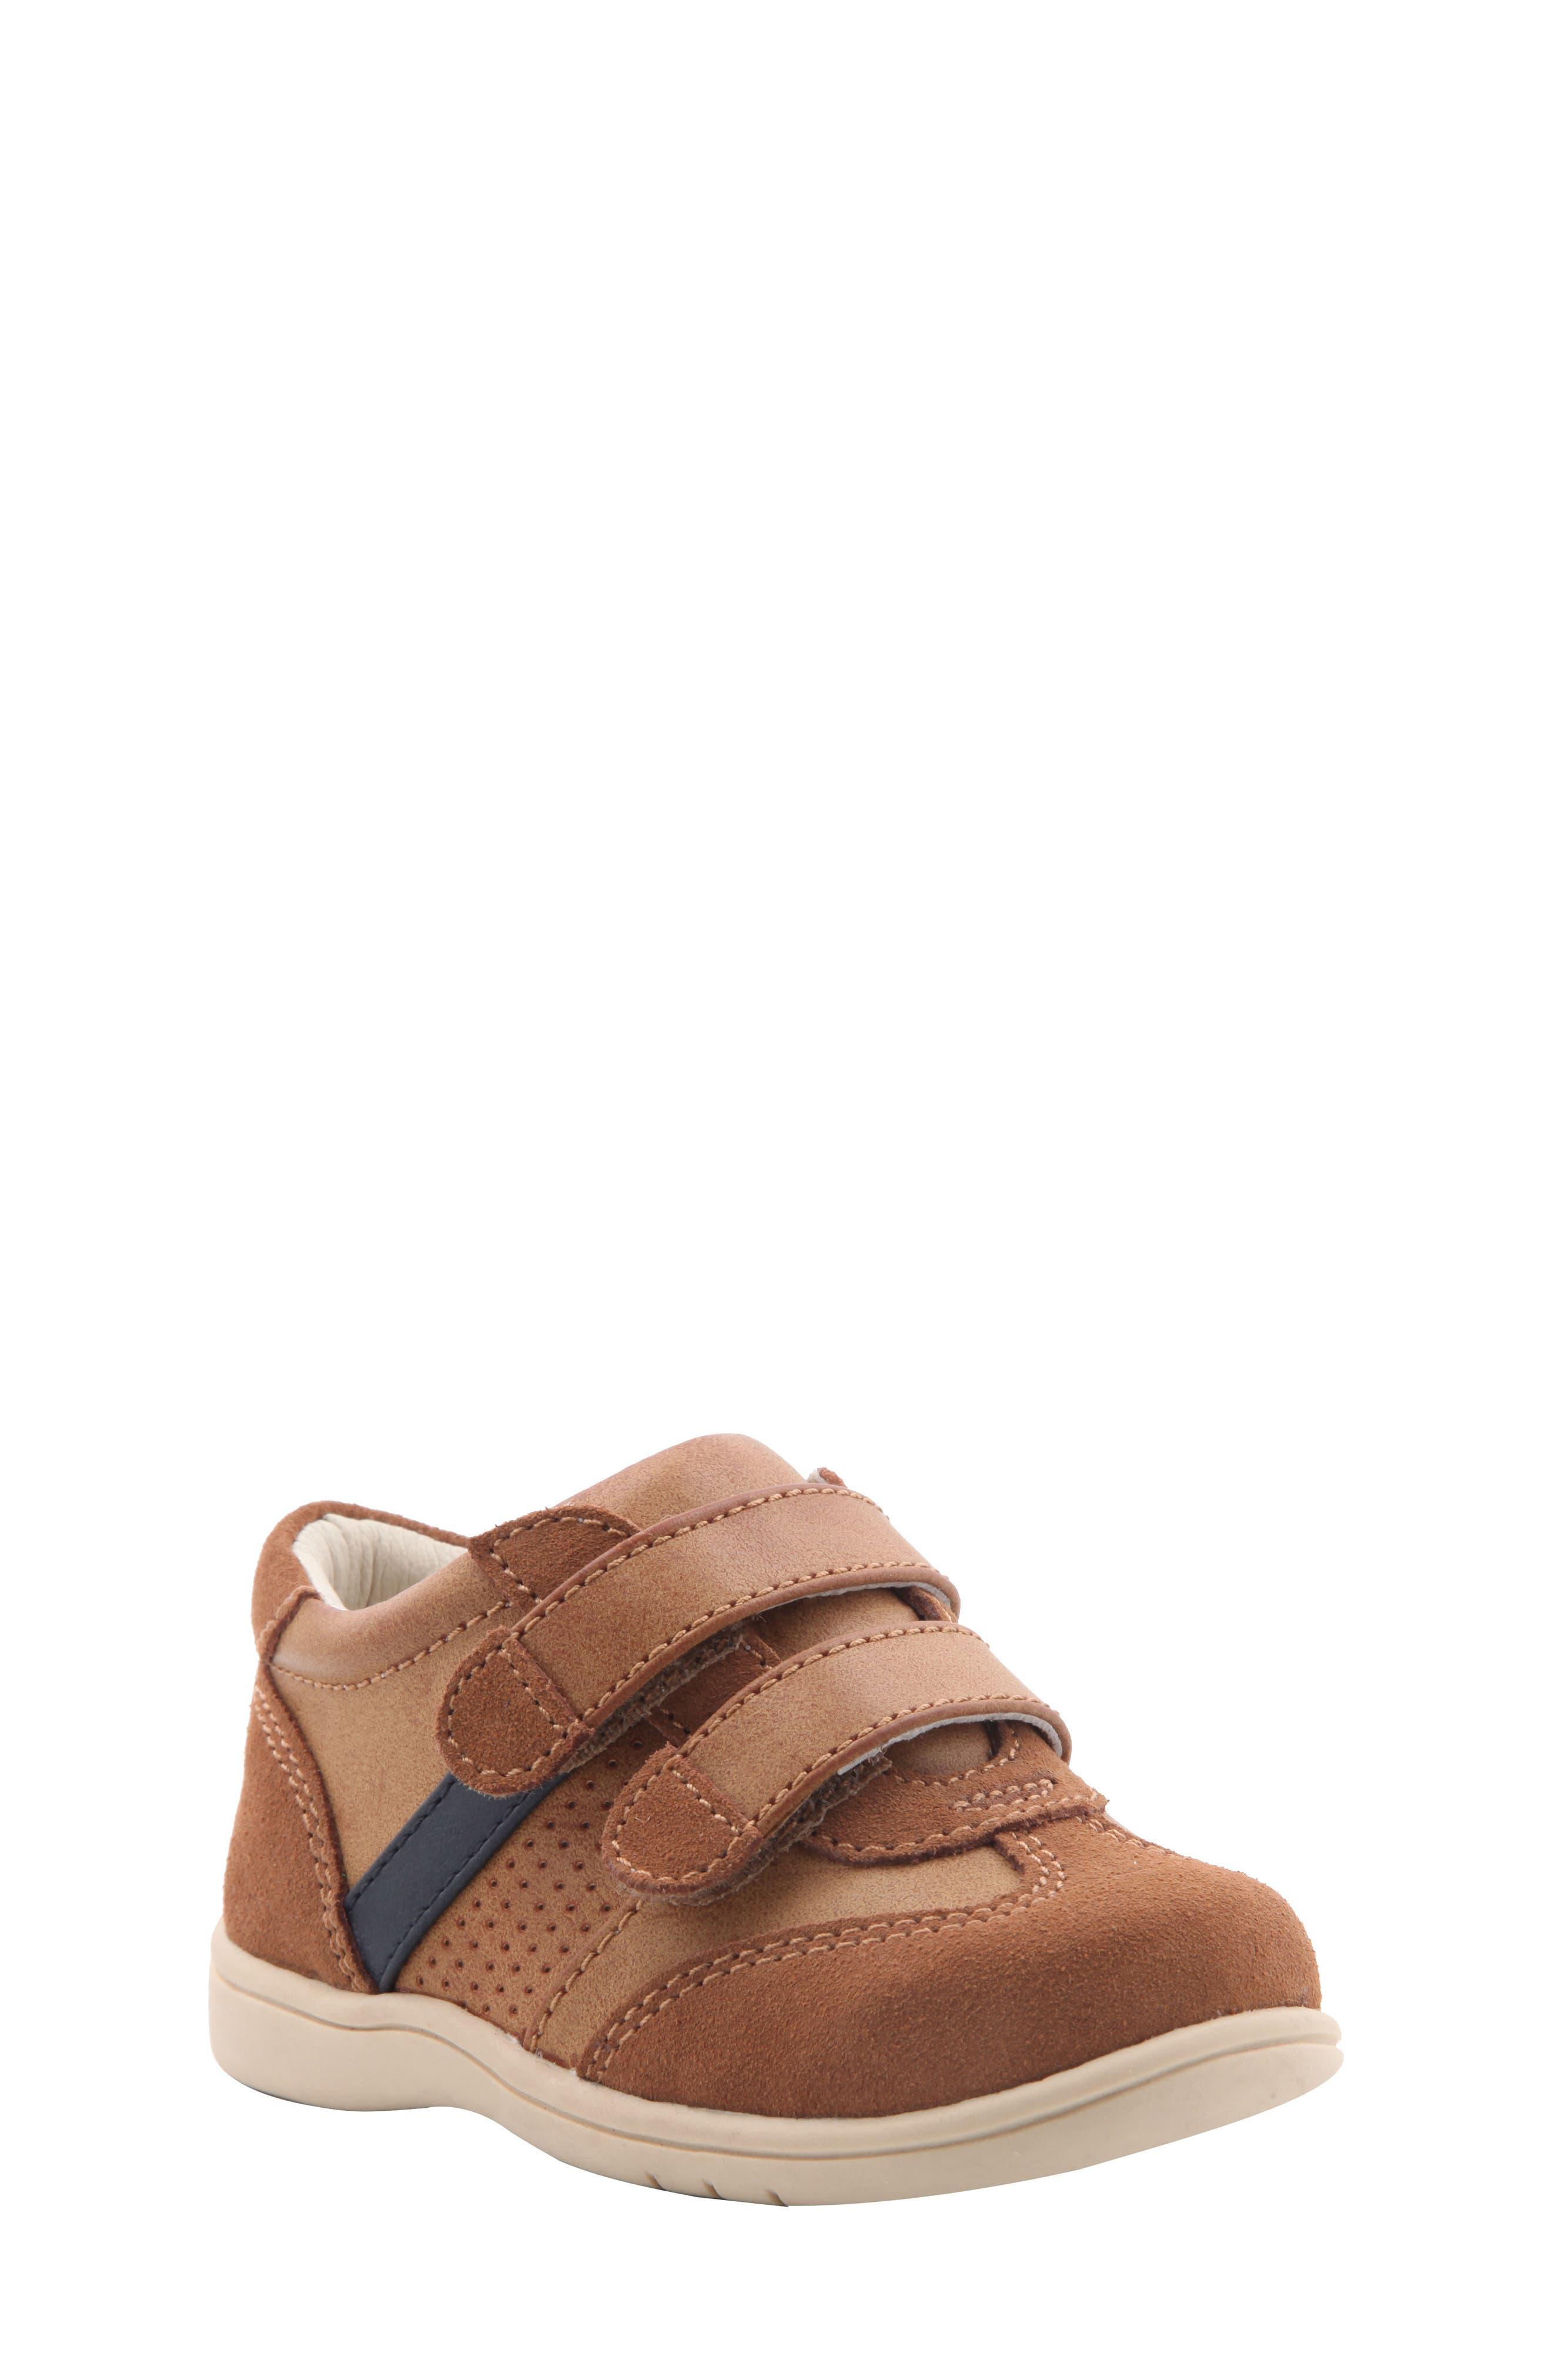 Nina 'Everest' Sneaker,                             Main thumbnail 3, color,